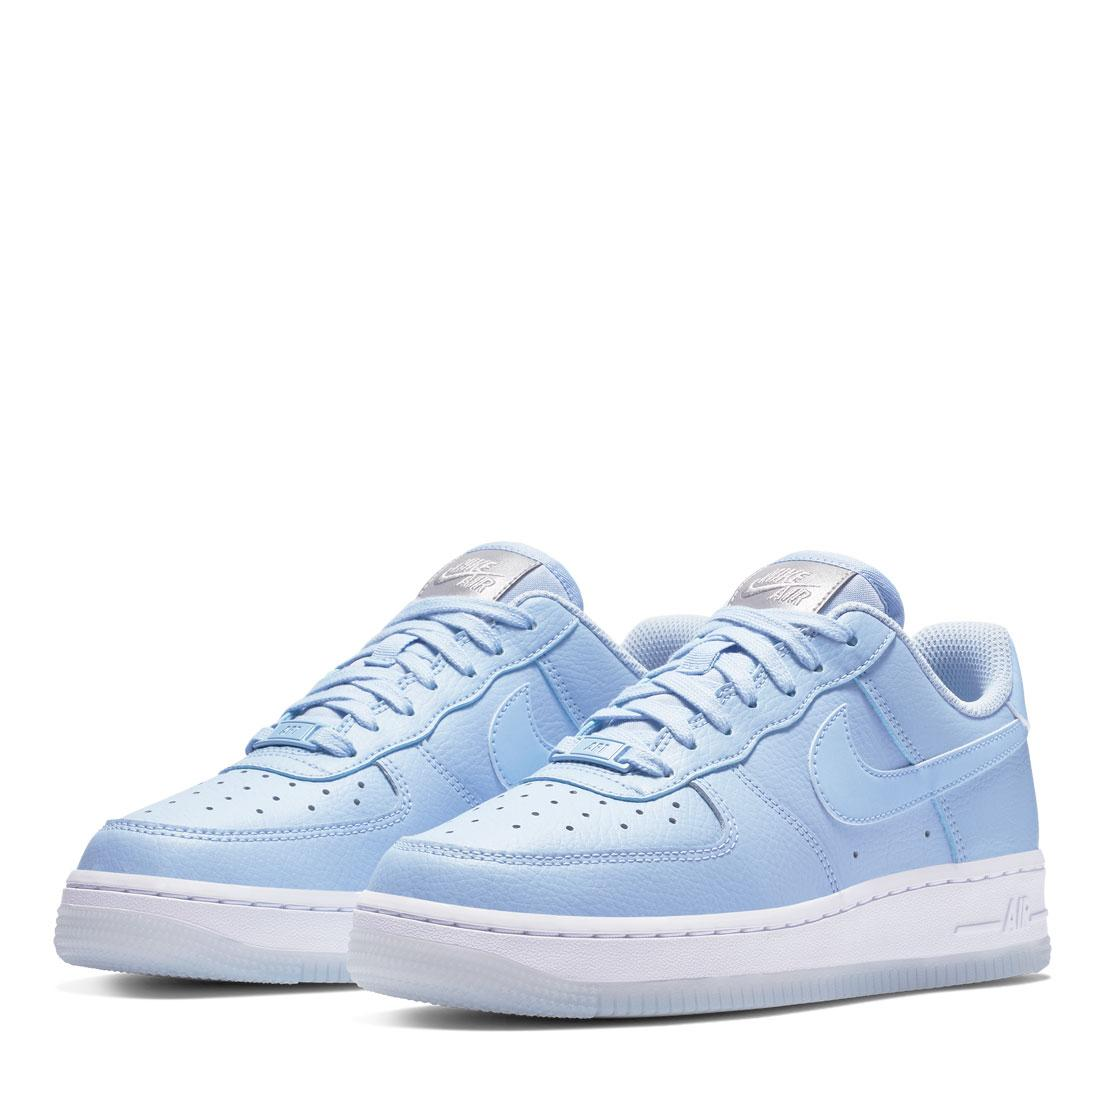 1d8e0054 Оригинальные женские кроссовки Nike Air Force 1 Low